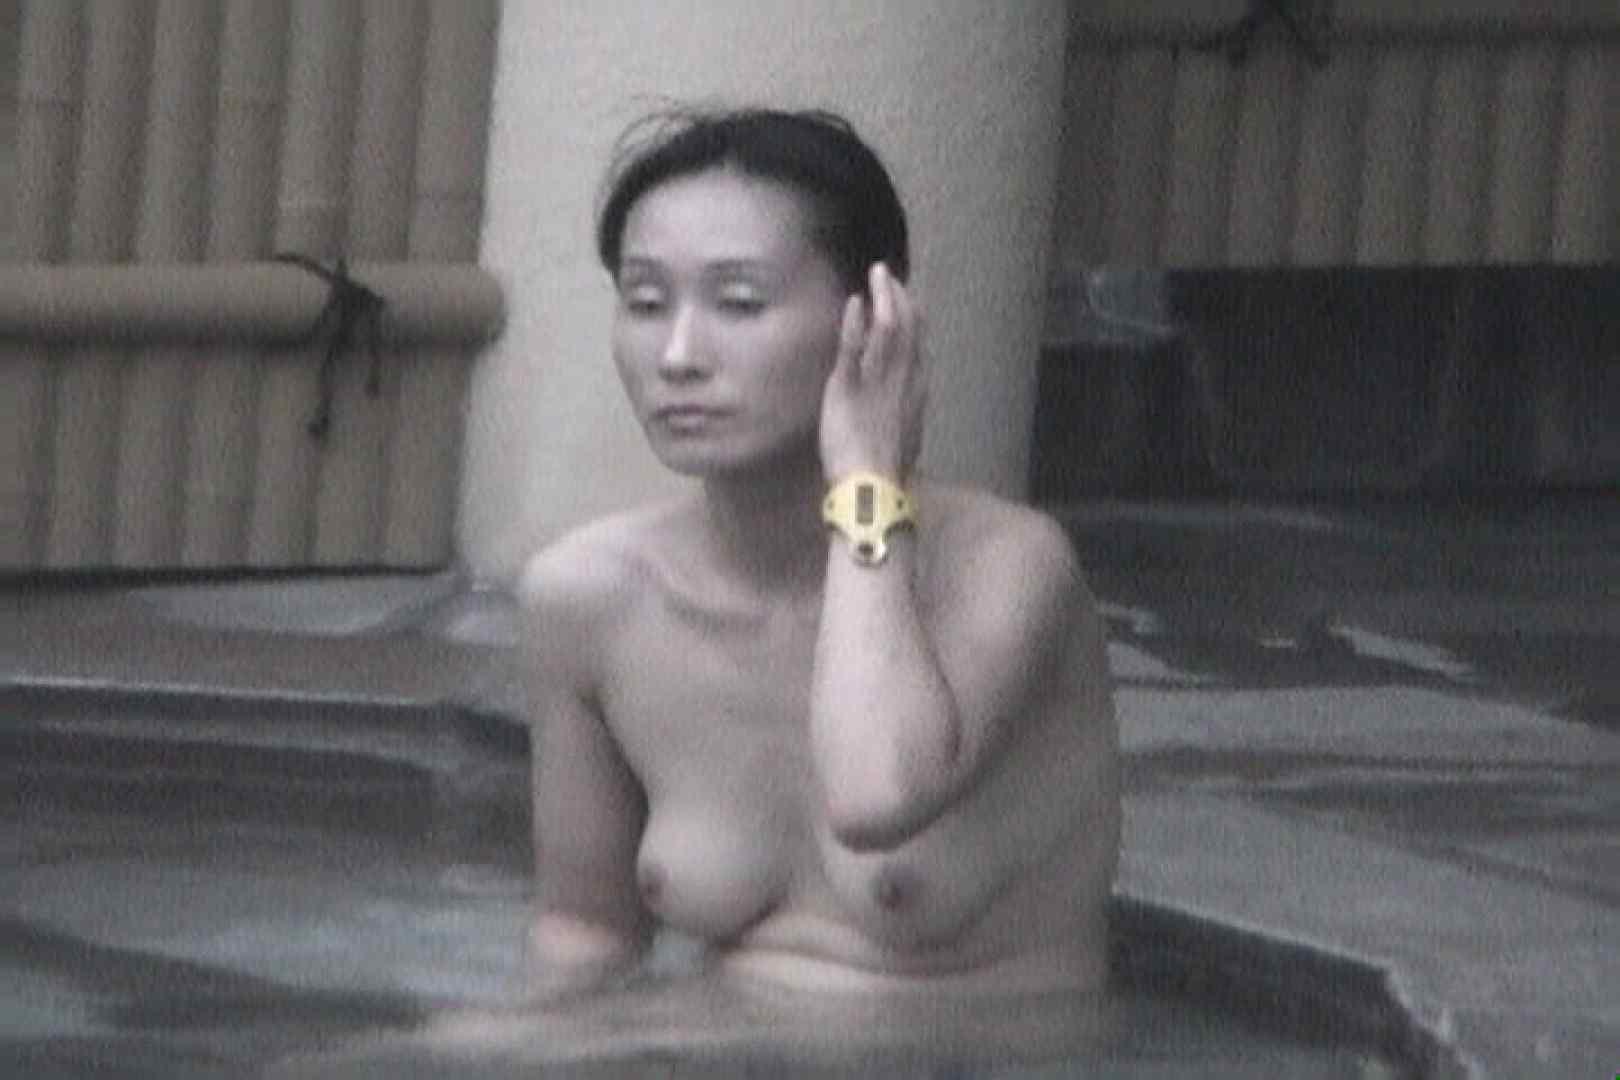 Aquaな露天風呂Vol.557 露天 | OL女体  40連発 7